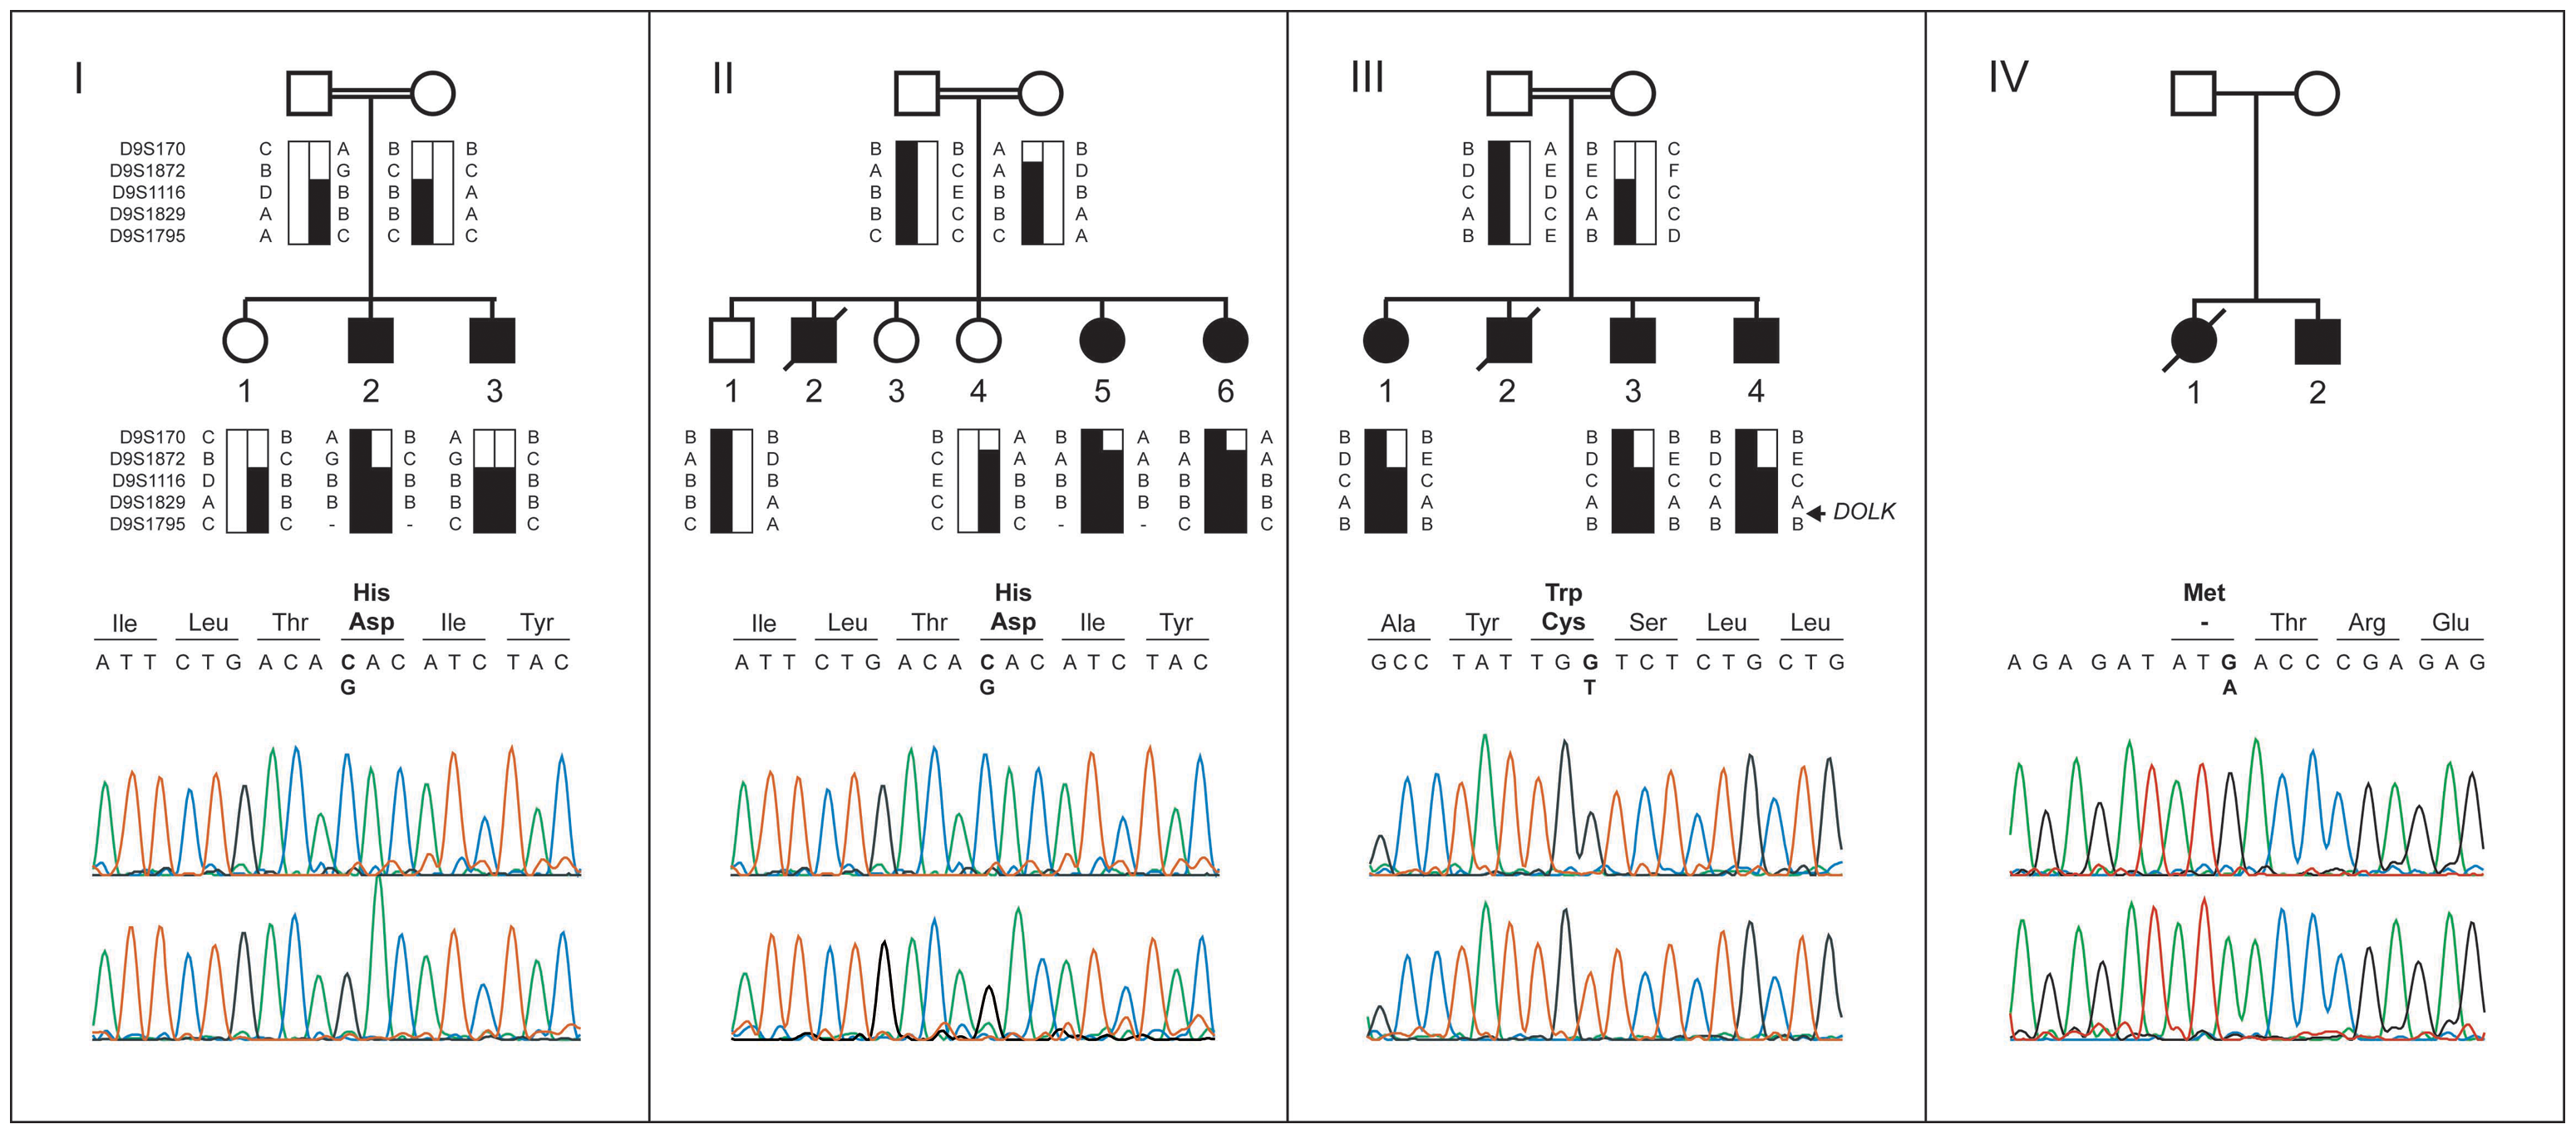 Pedigrees, haplotypes, and mutation analysis of families I through IV.